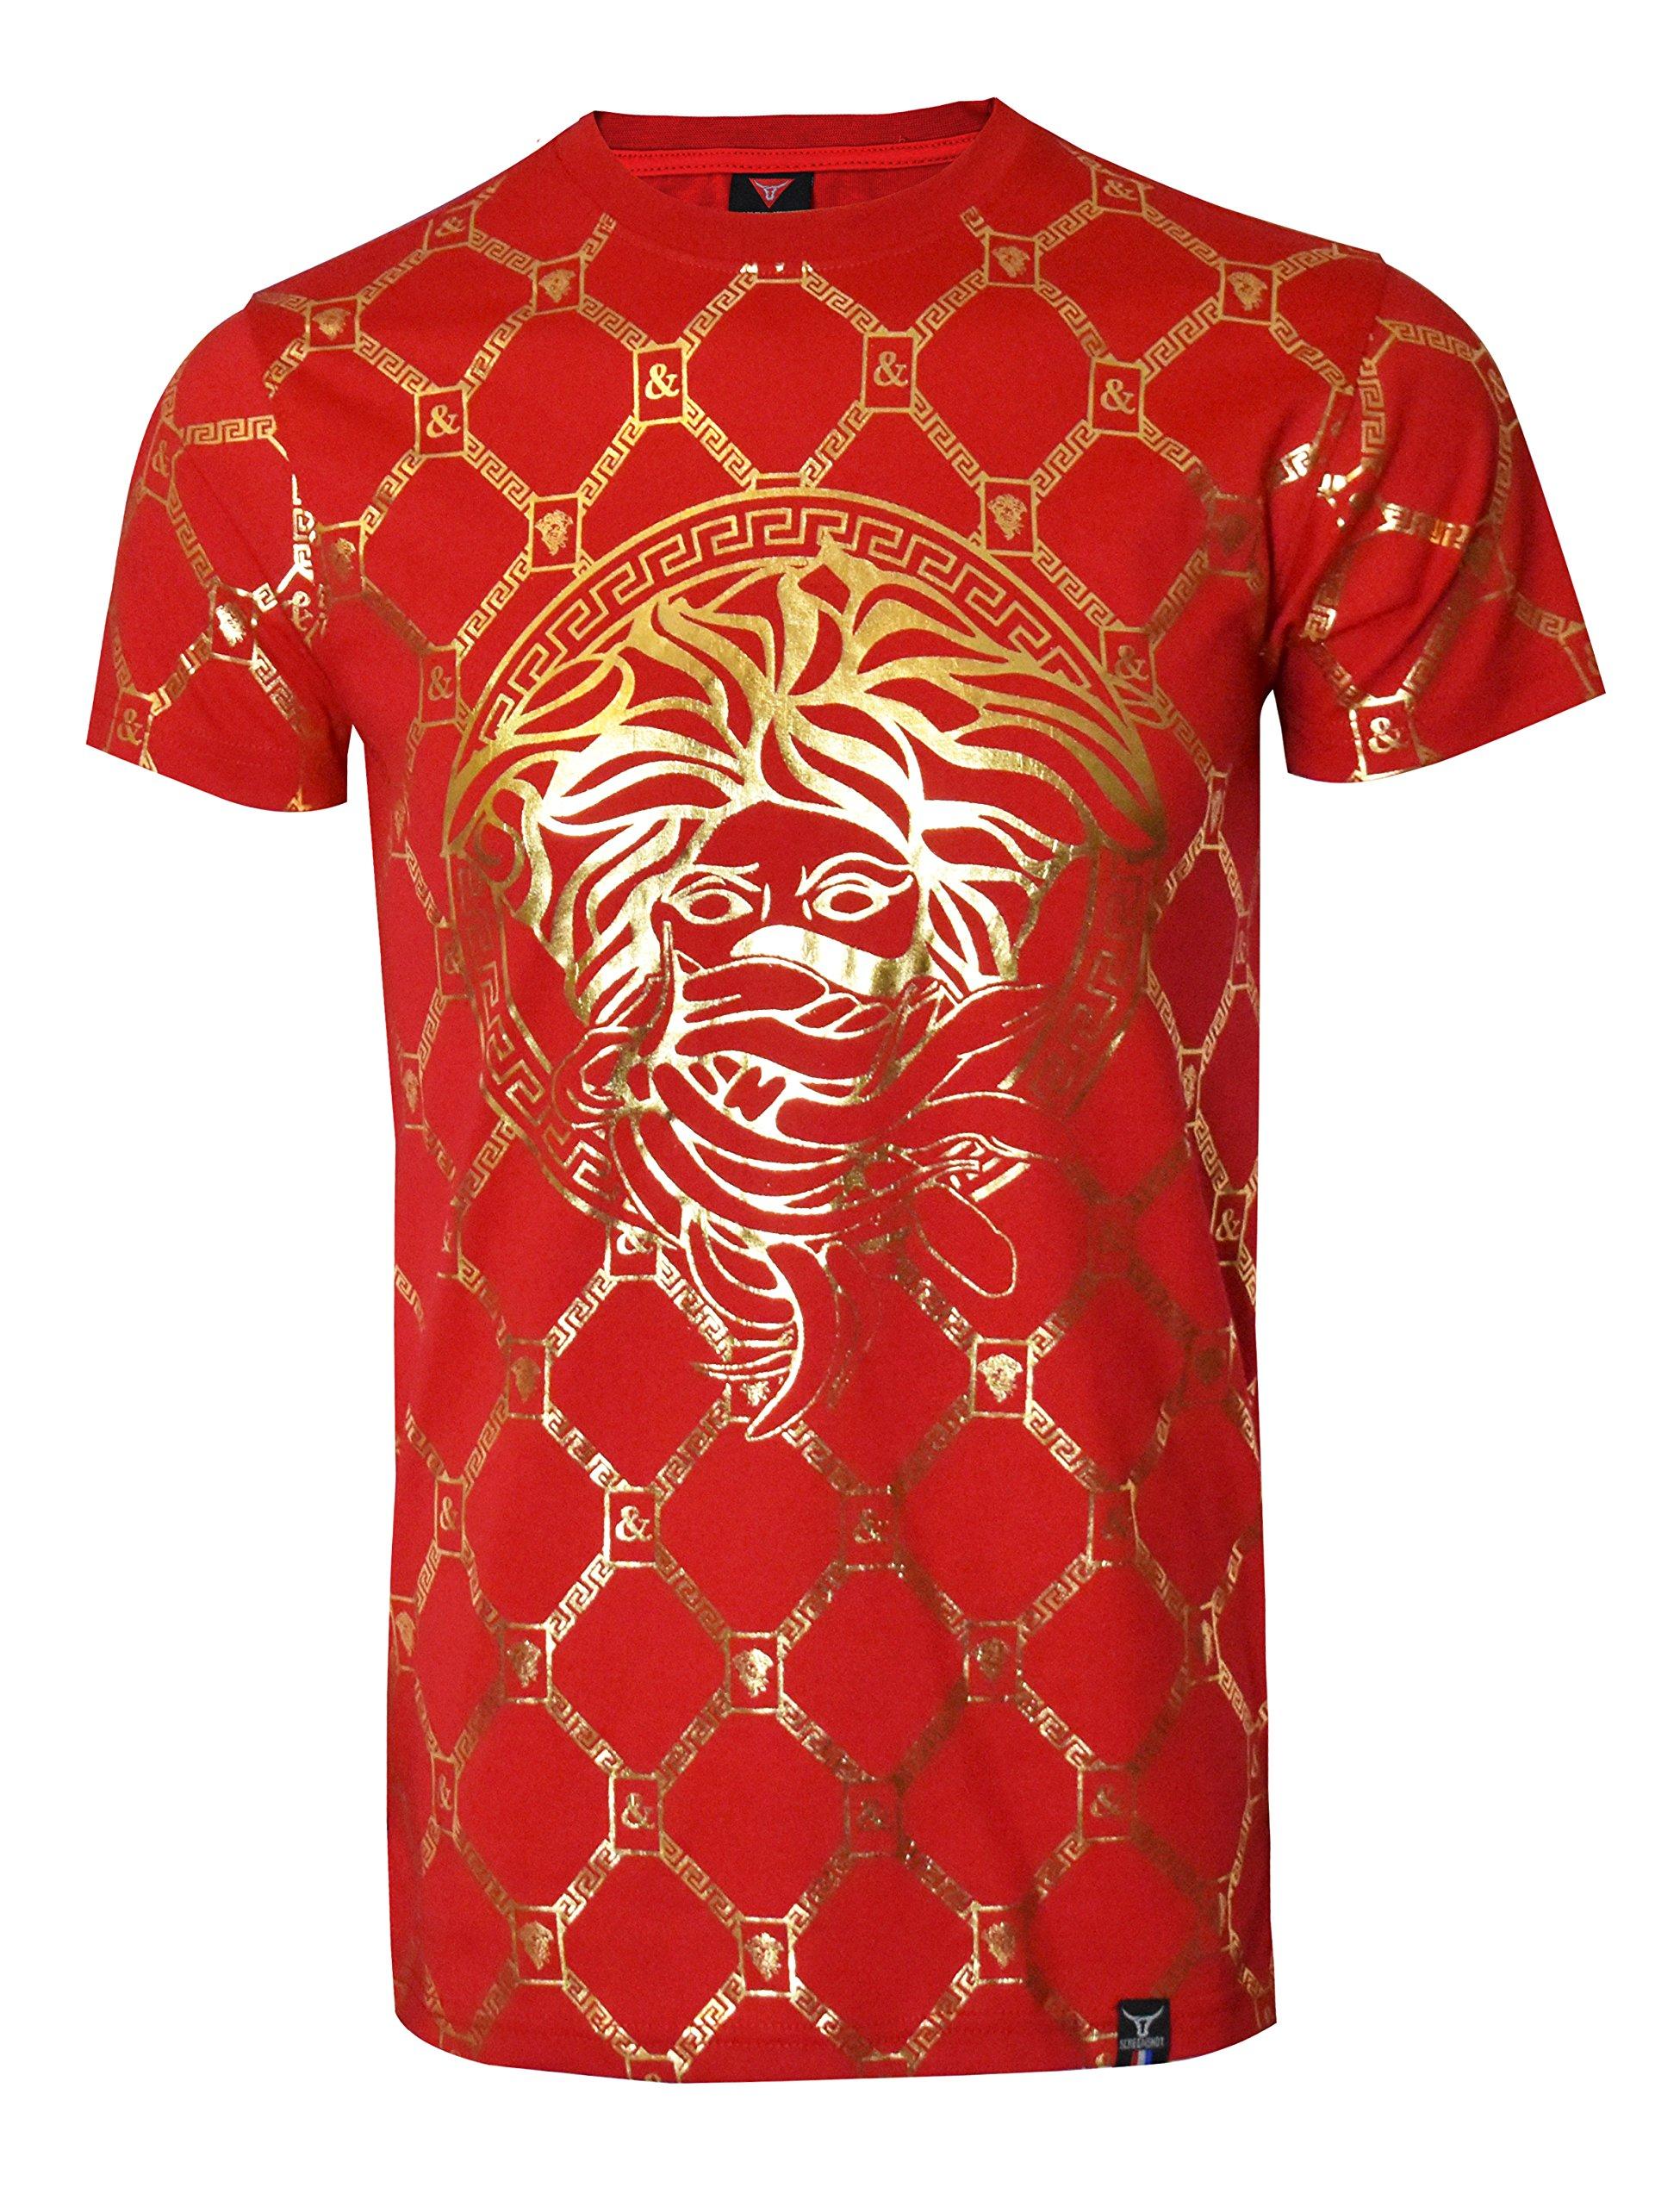 SCREENSHOTBRAND-S11821 Mens Hipster Hip-Hop Premium Tees - Stylish Longline Fashion Luxury T-Shirt Medusa Gold Print - Red - Large